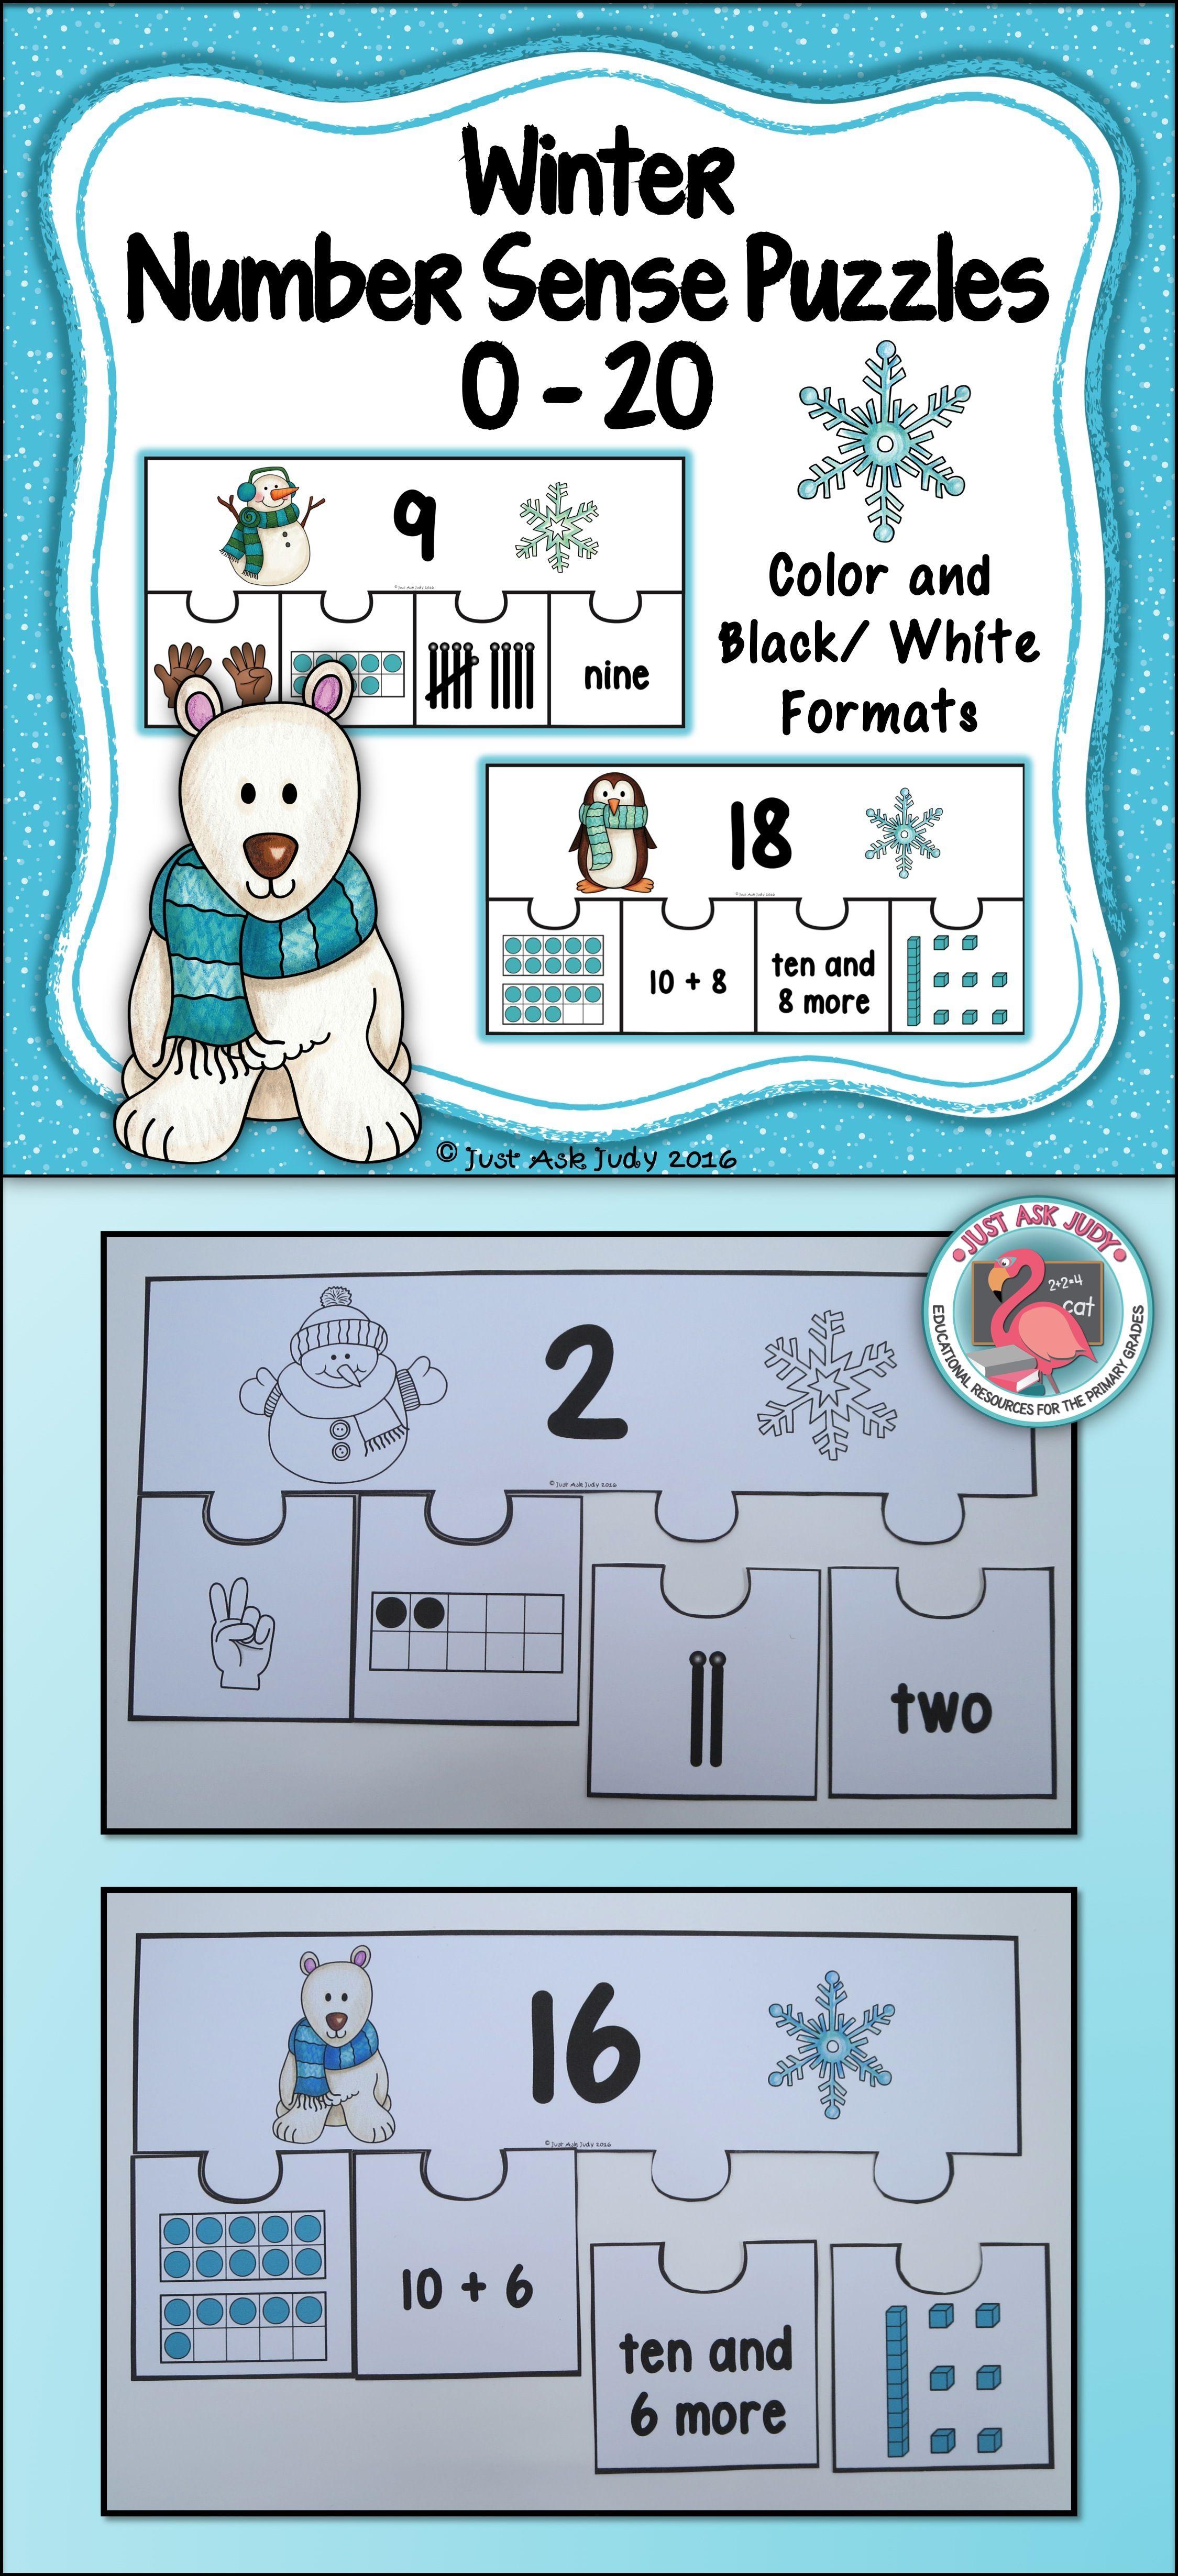 Number Sense 0-20 Winter Puzzles   Number sense activities, Senses ...